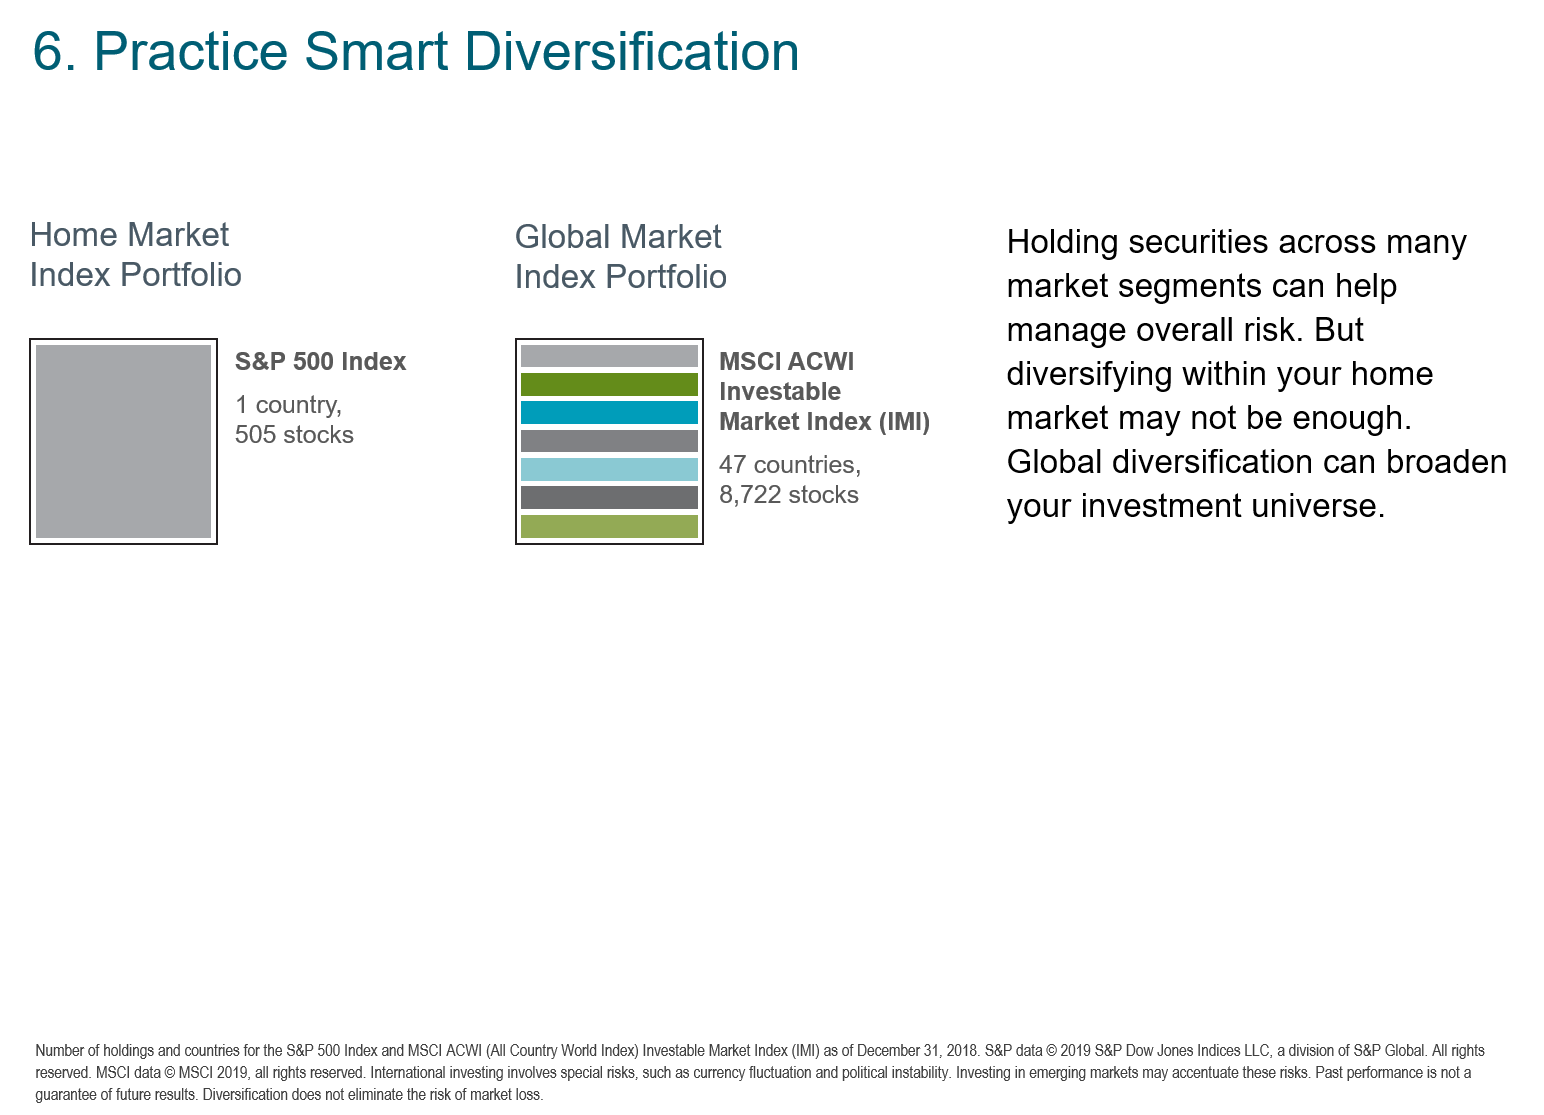 2019 Practice Smart Diversification.png